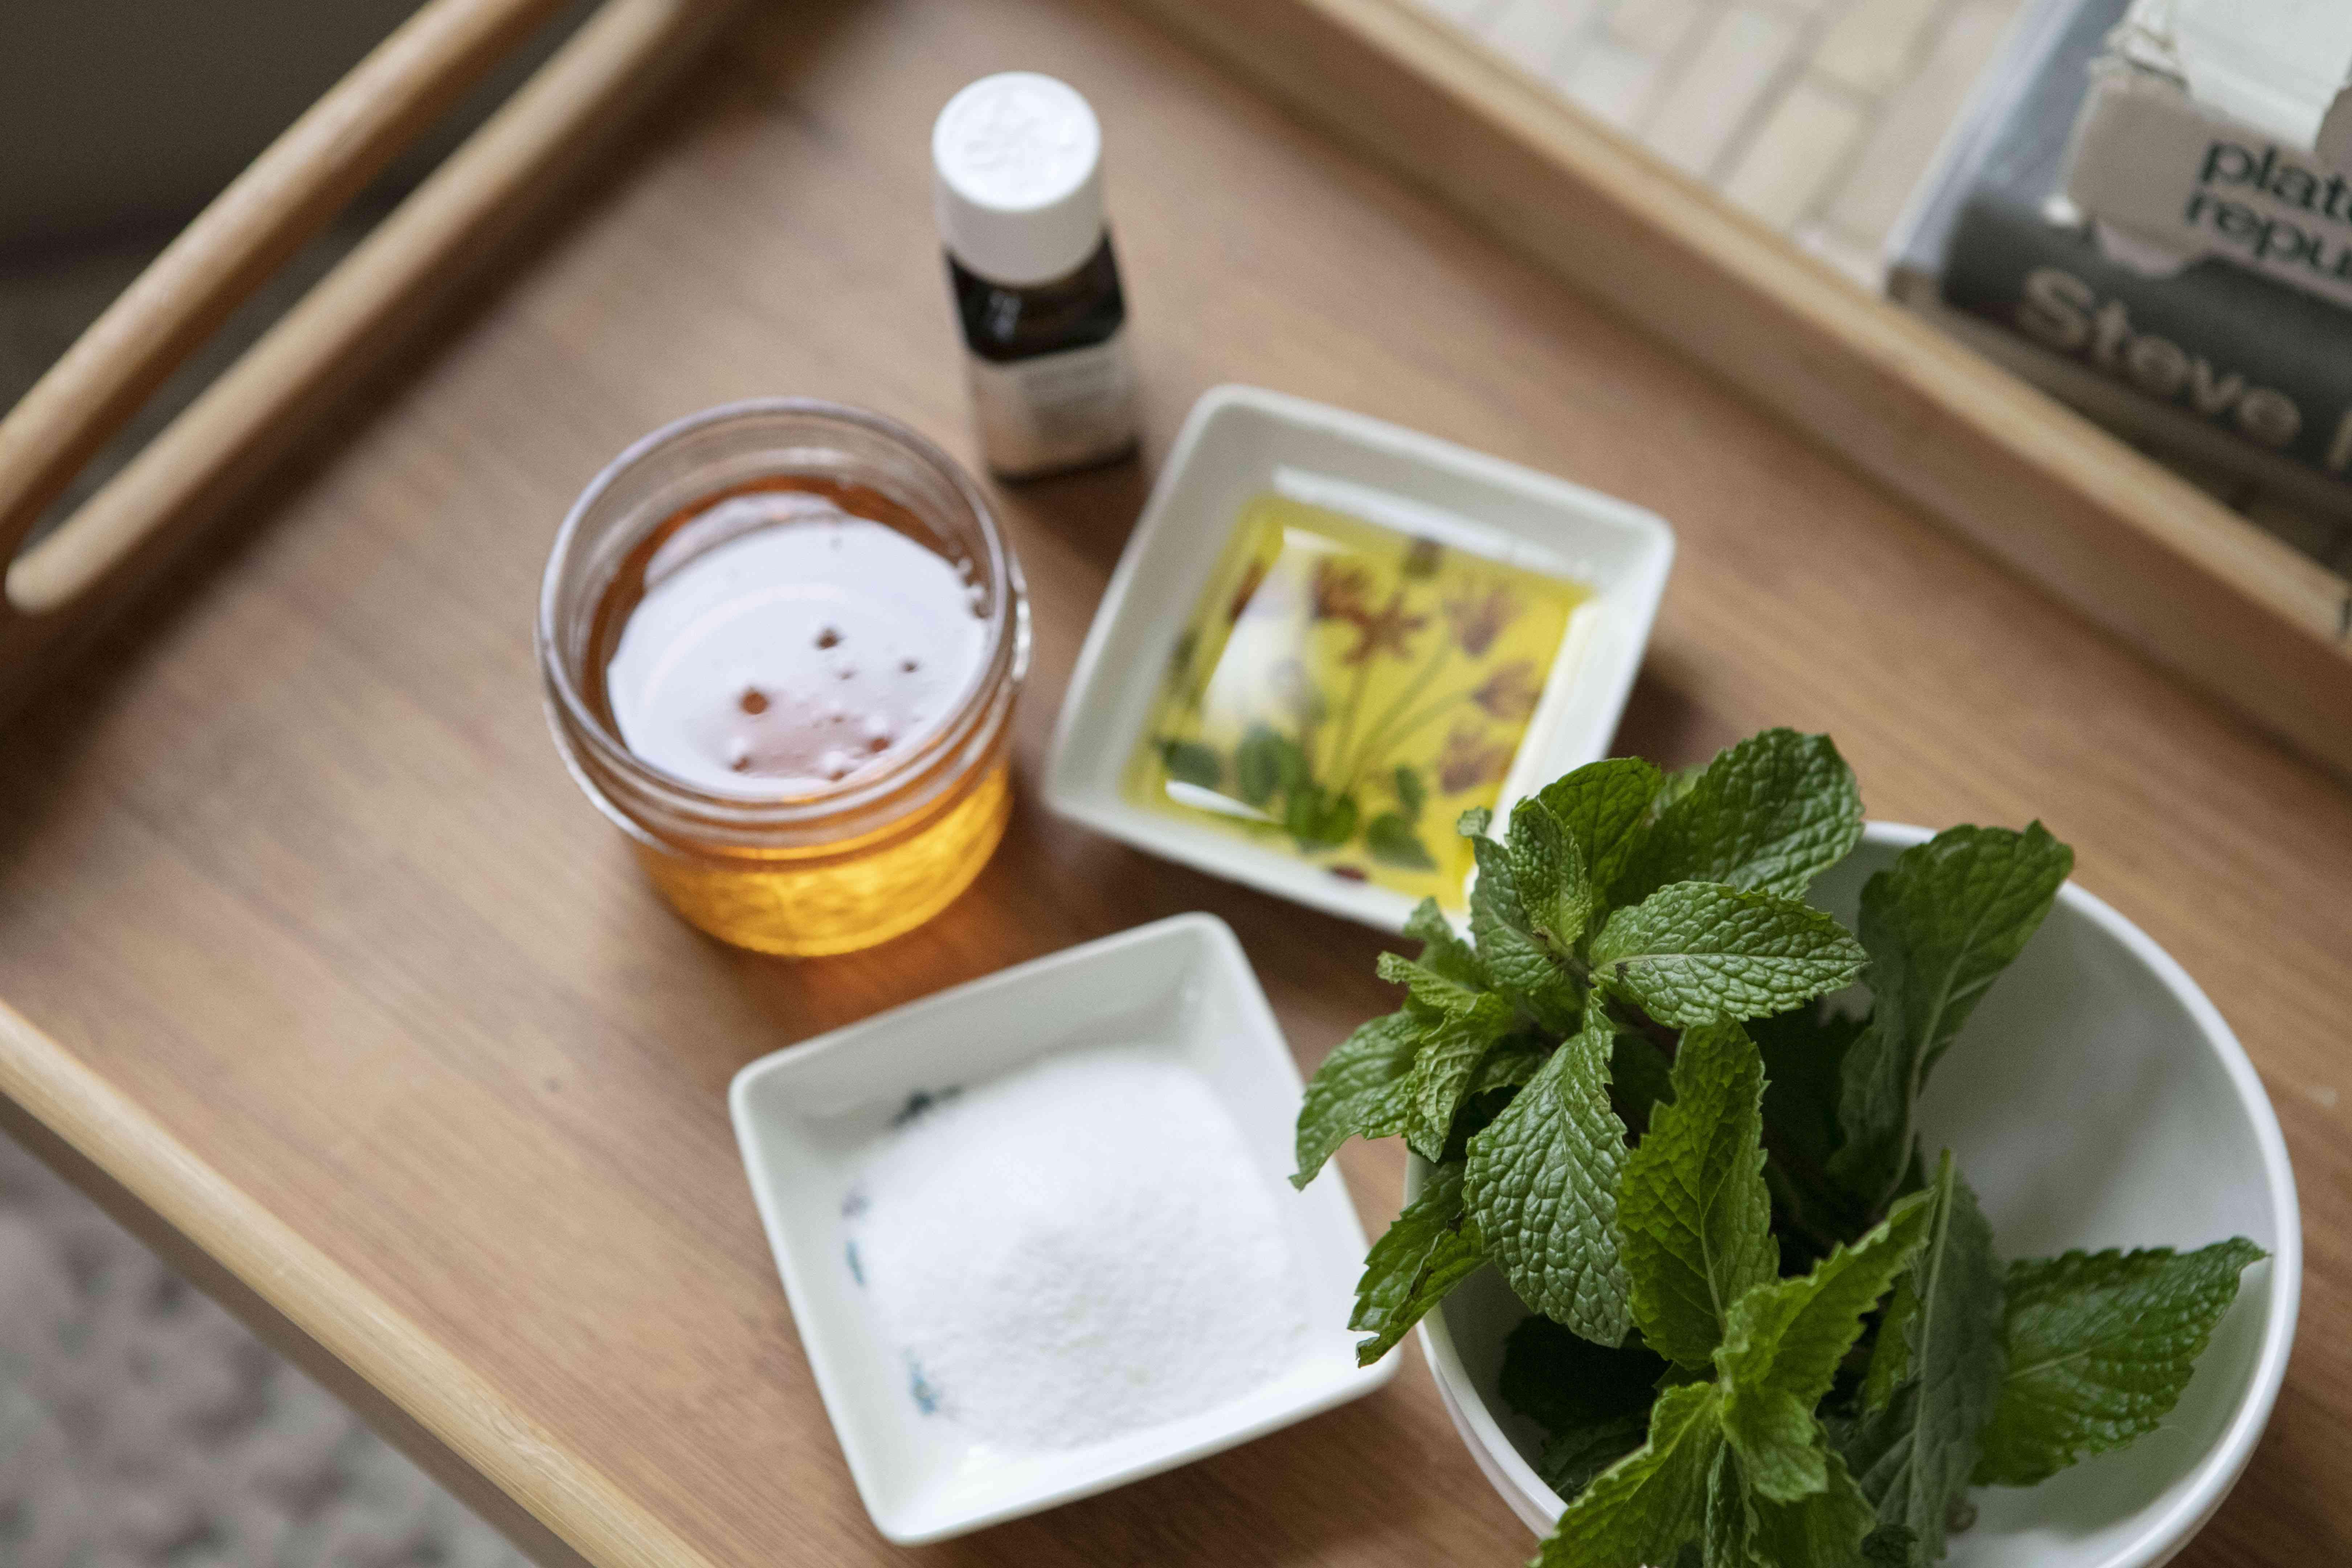 fresh mint, sugar, olive oil, and honey on a wooden tray for DIY lip scrub